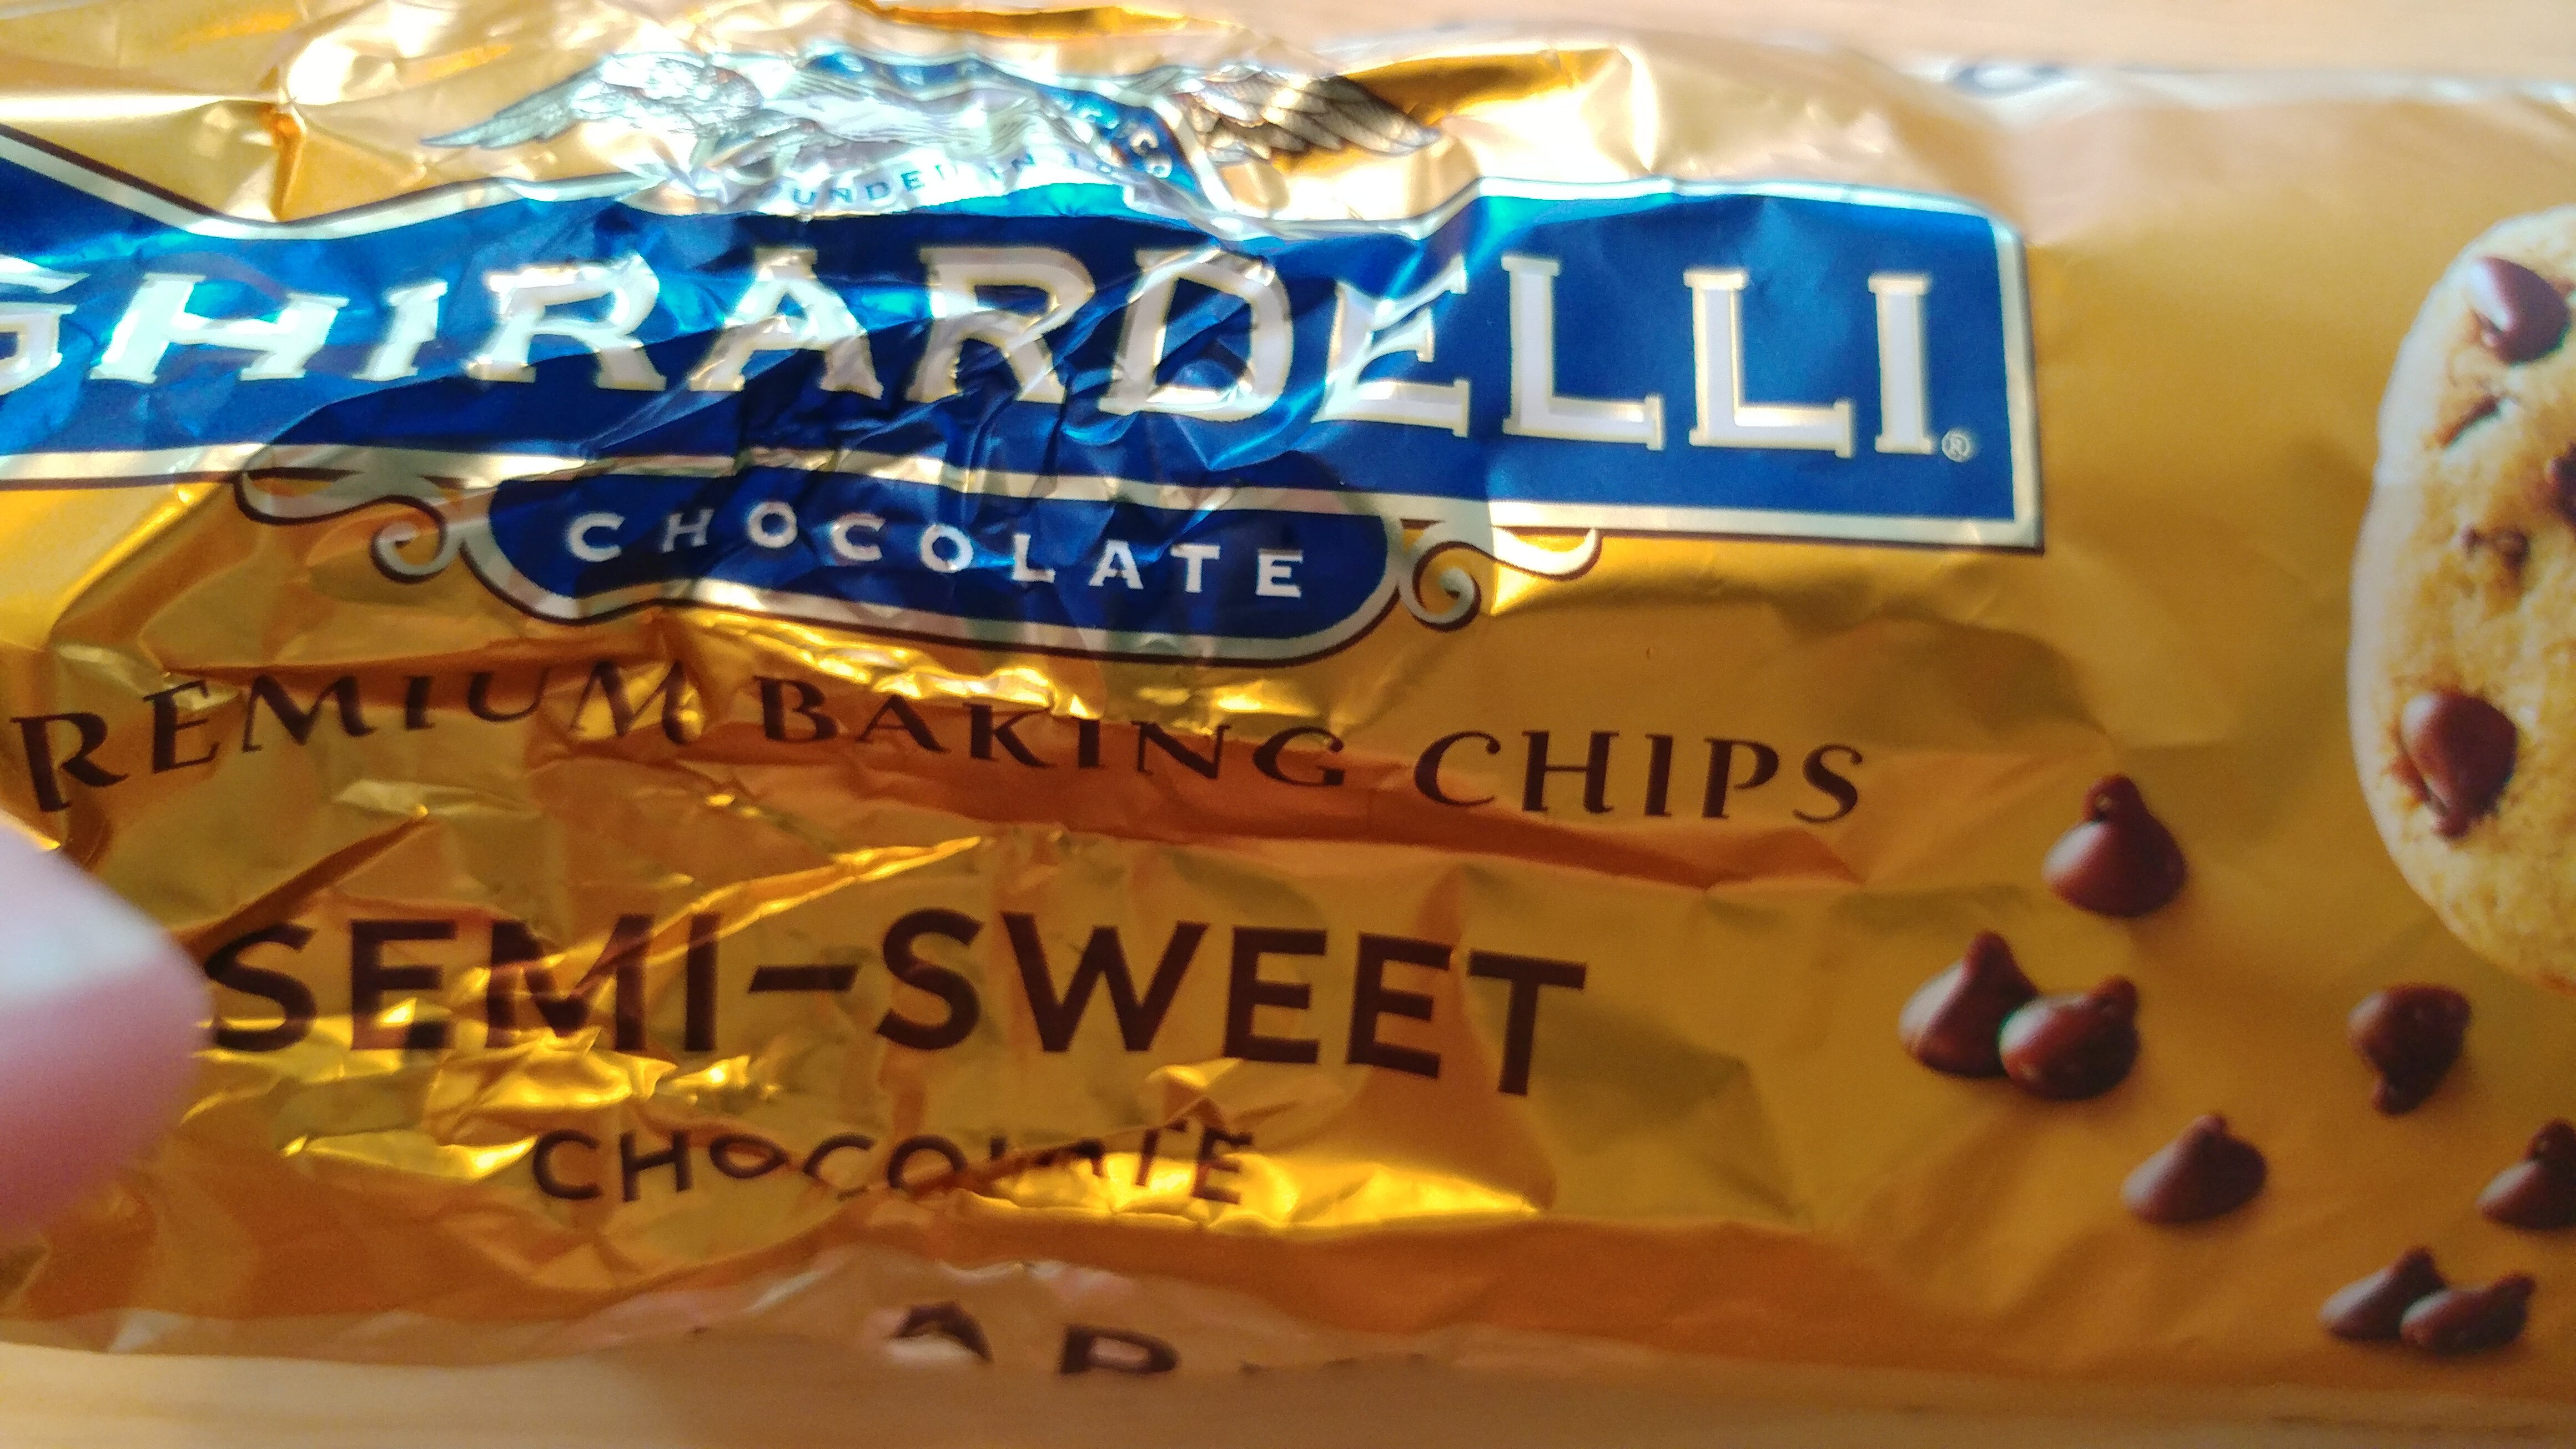 Premium Baking Chips, Semi-Sweet Chocolate - Product